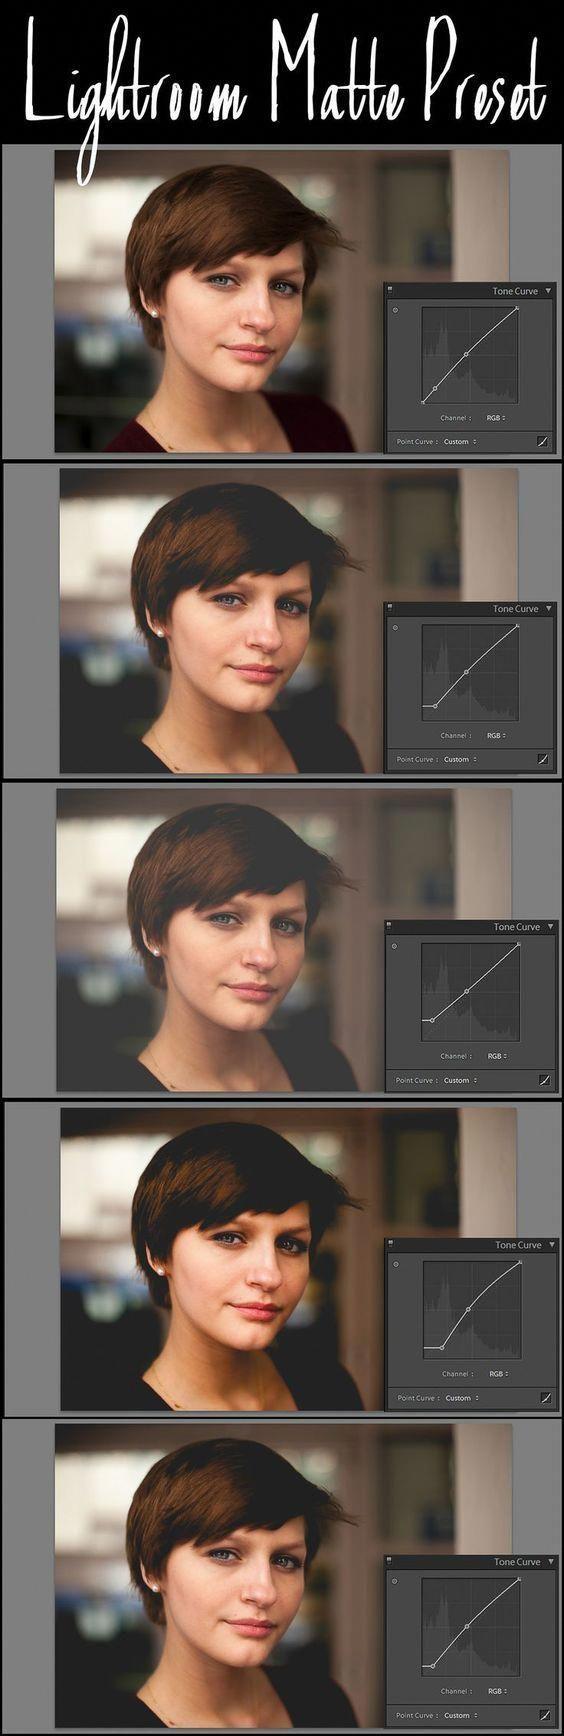 Lightroom Tone Curve Tutorial & Free Matte Preset | Flourish | Free Resources for Pro Photographers